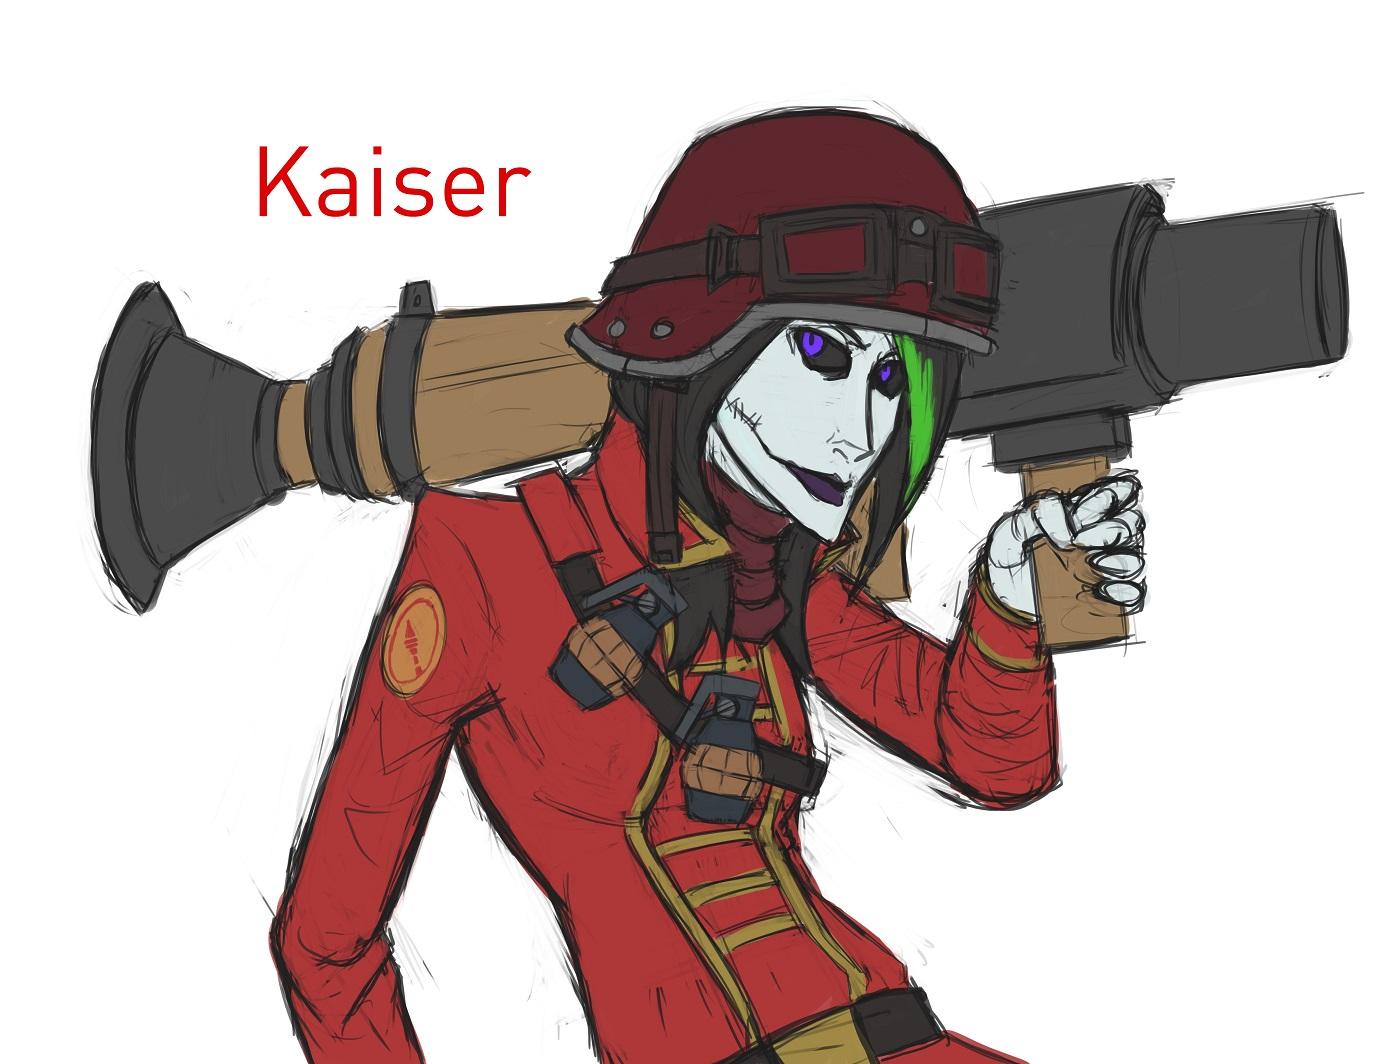 Karalie the Soldier